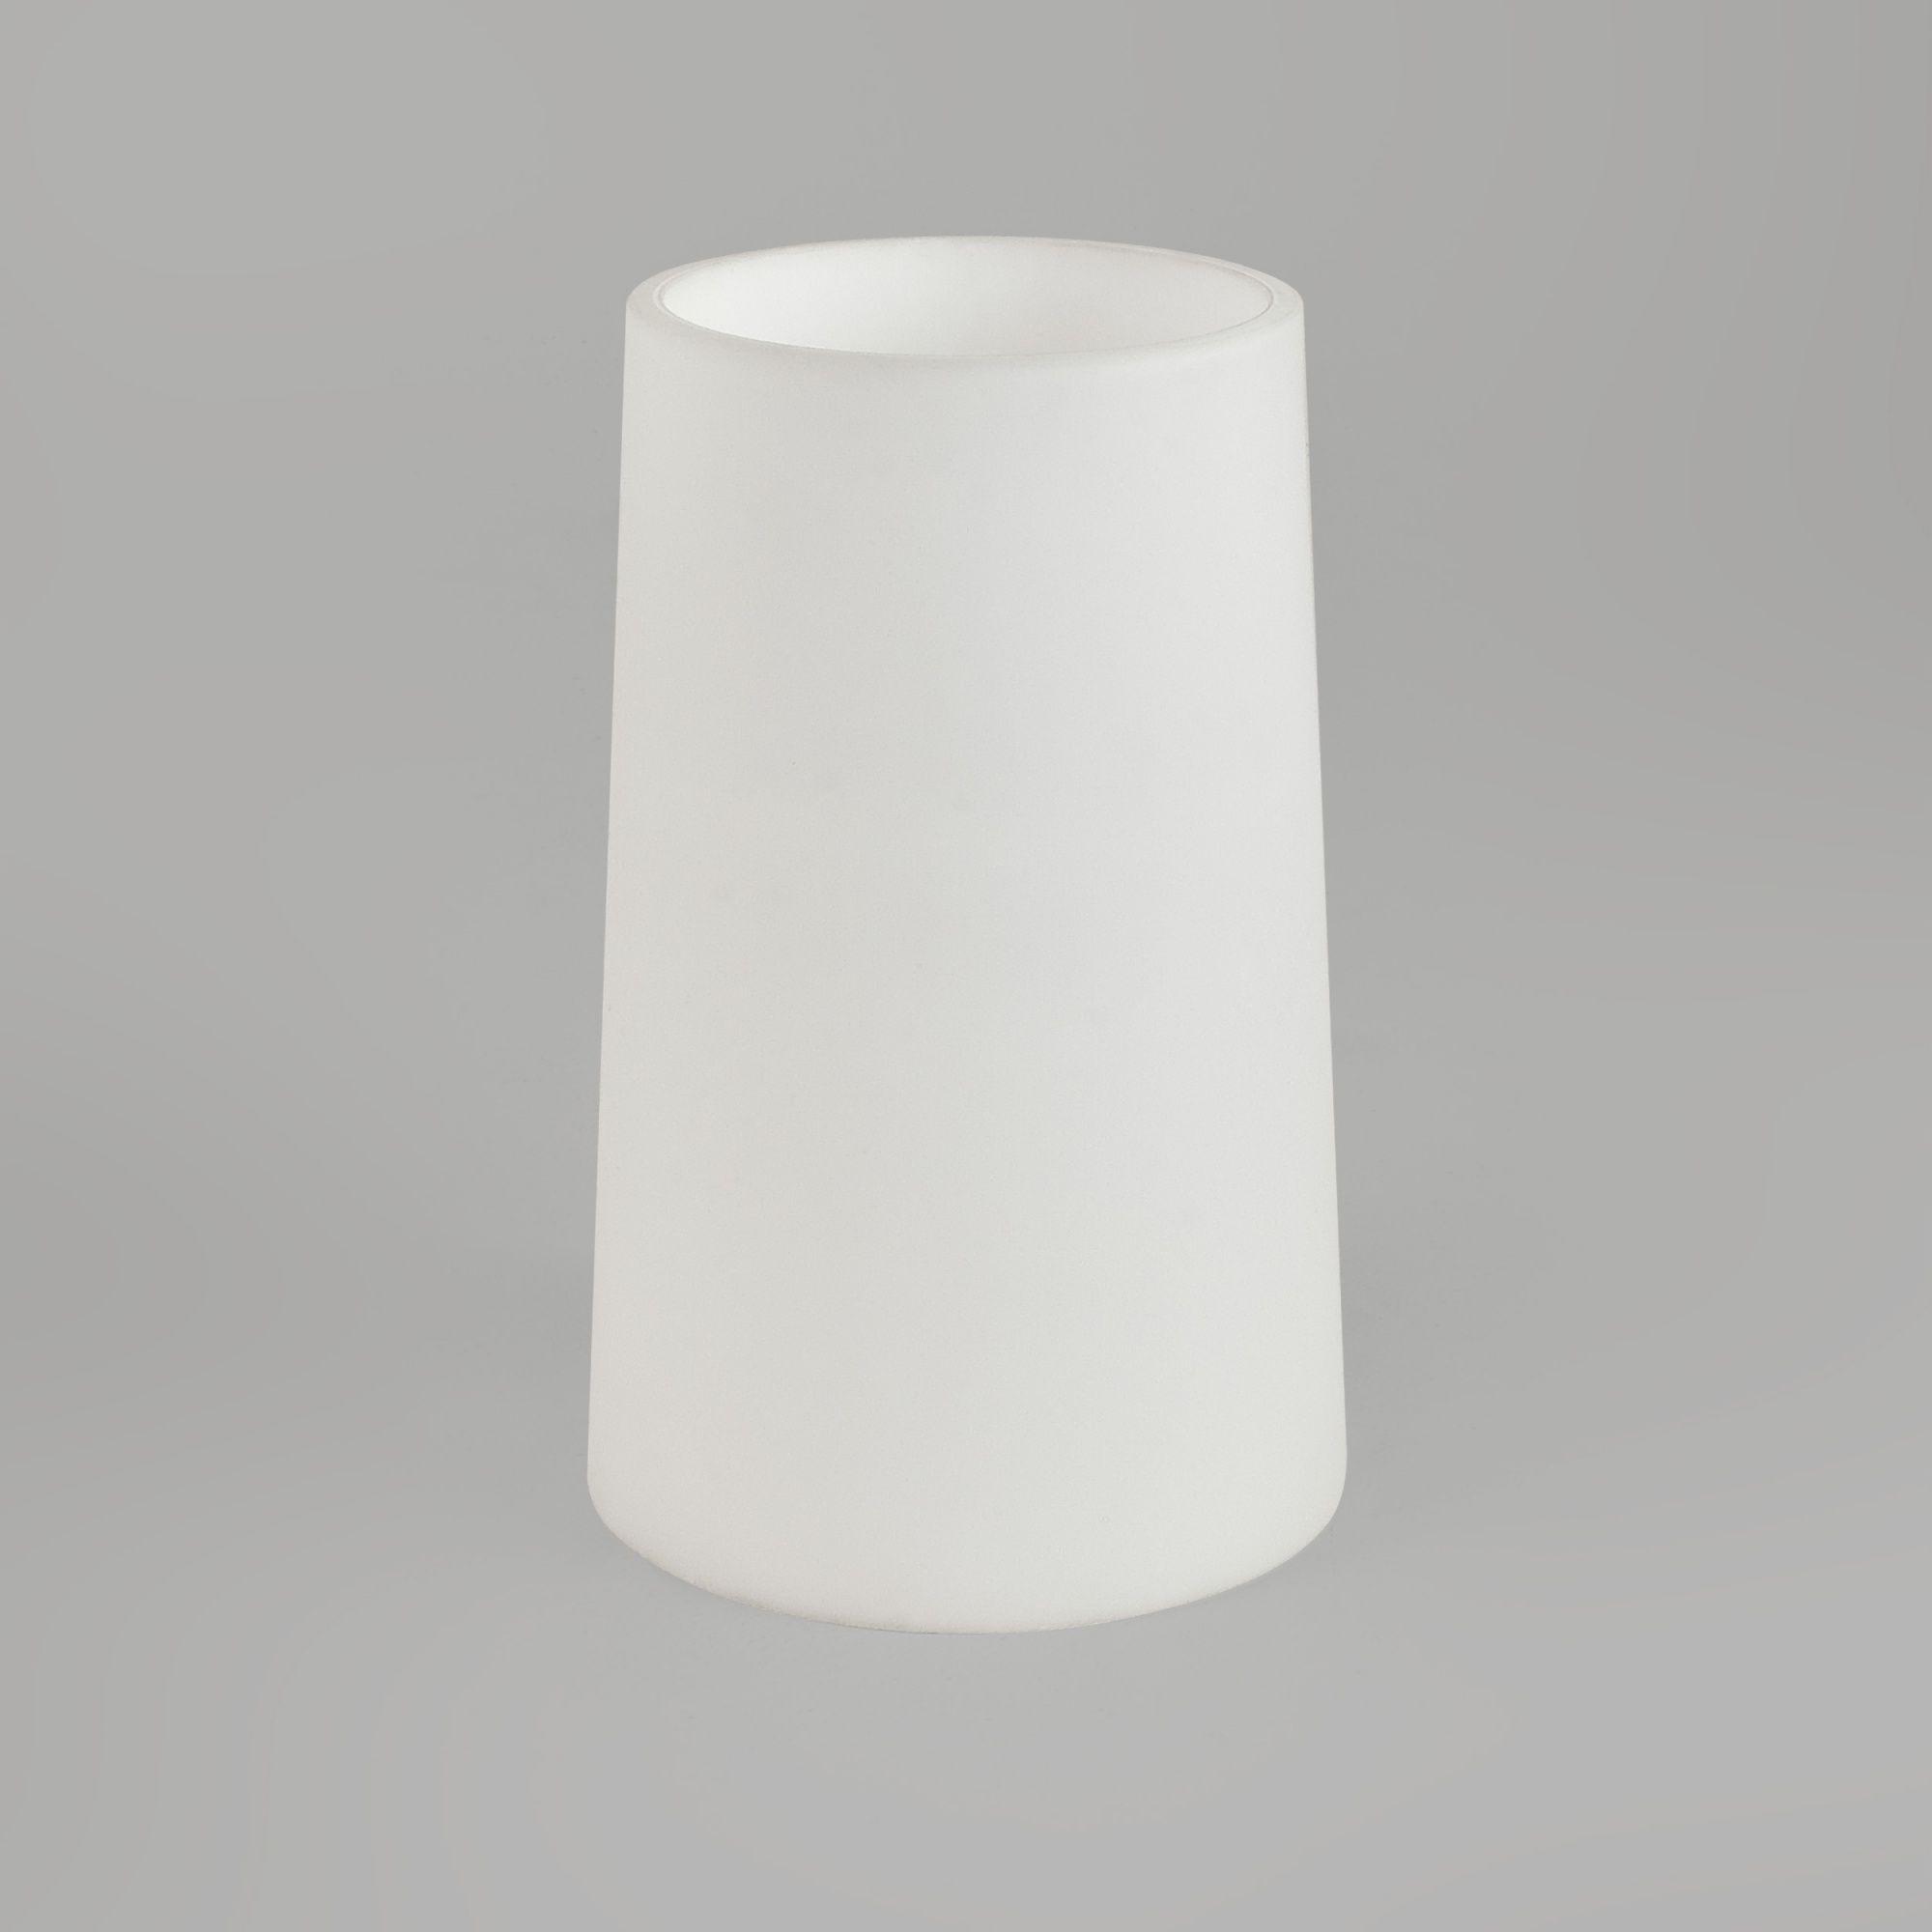 Klosz Cone 195 4079 Biały Astro Lighting